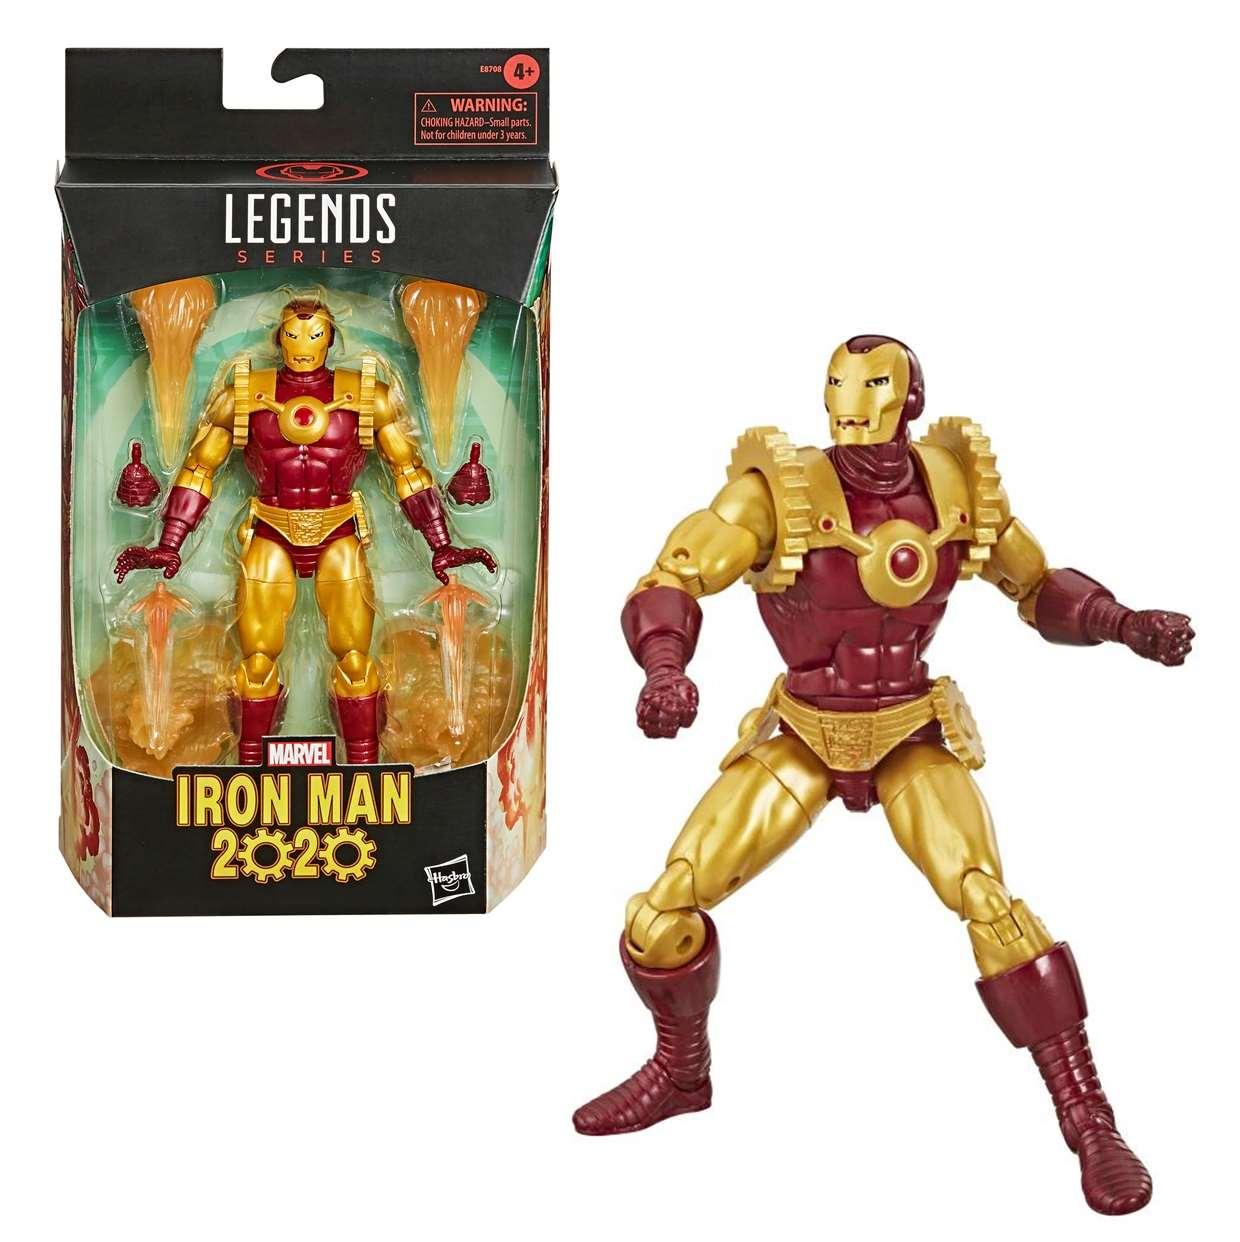 Iron Man 2020 Figura Marvel Legends Series 6 Pulgadas